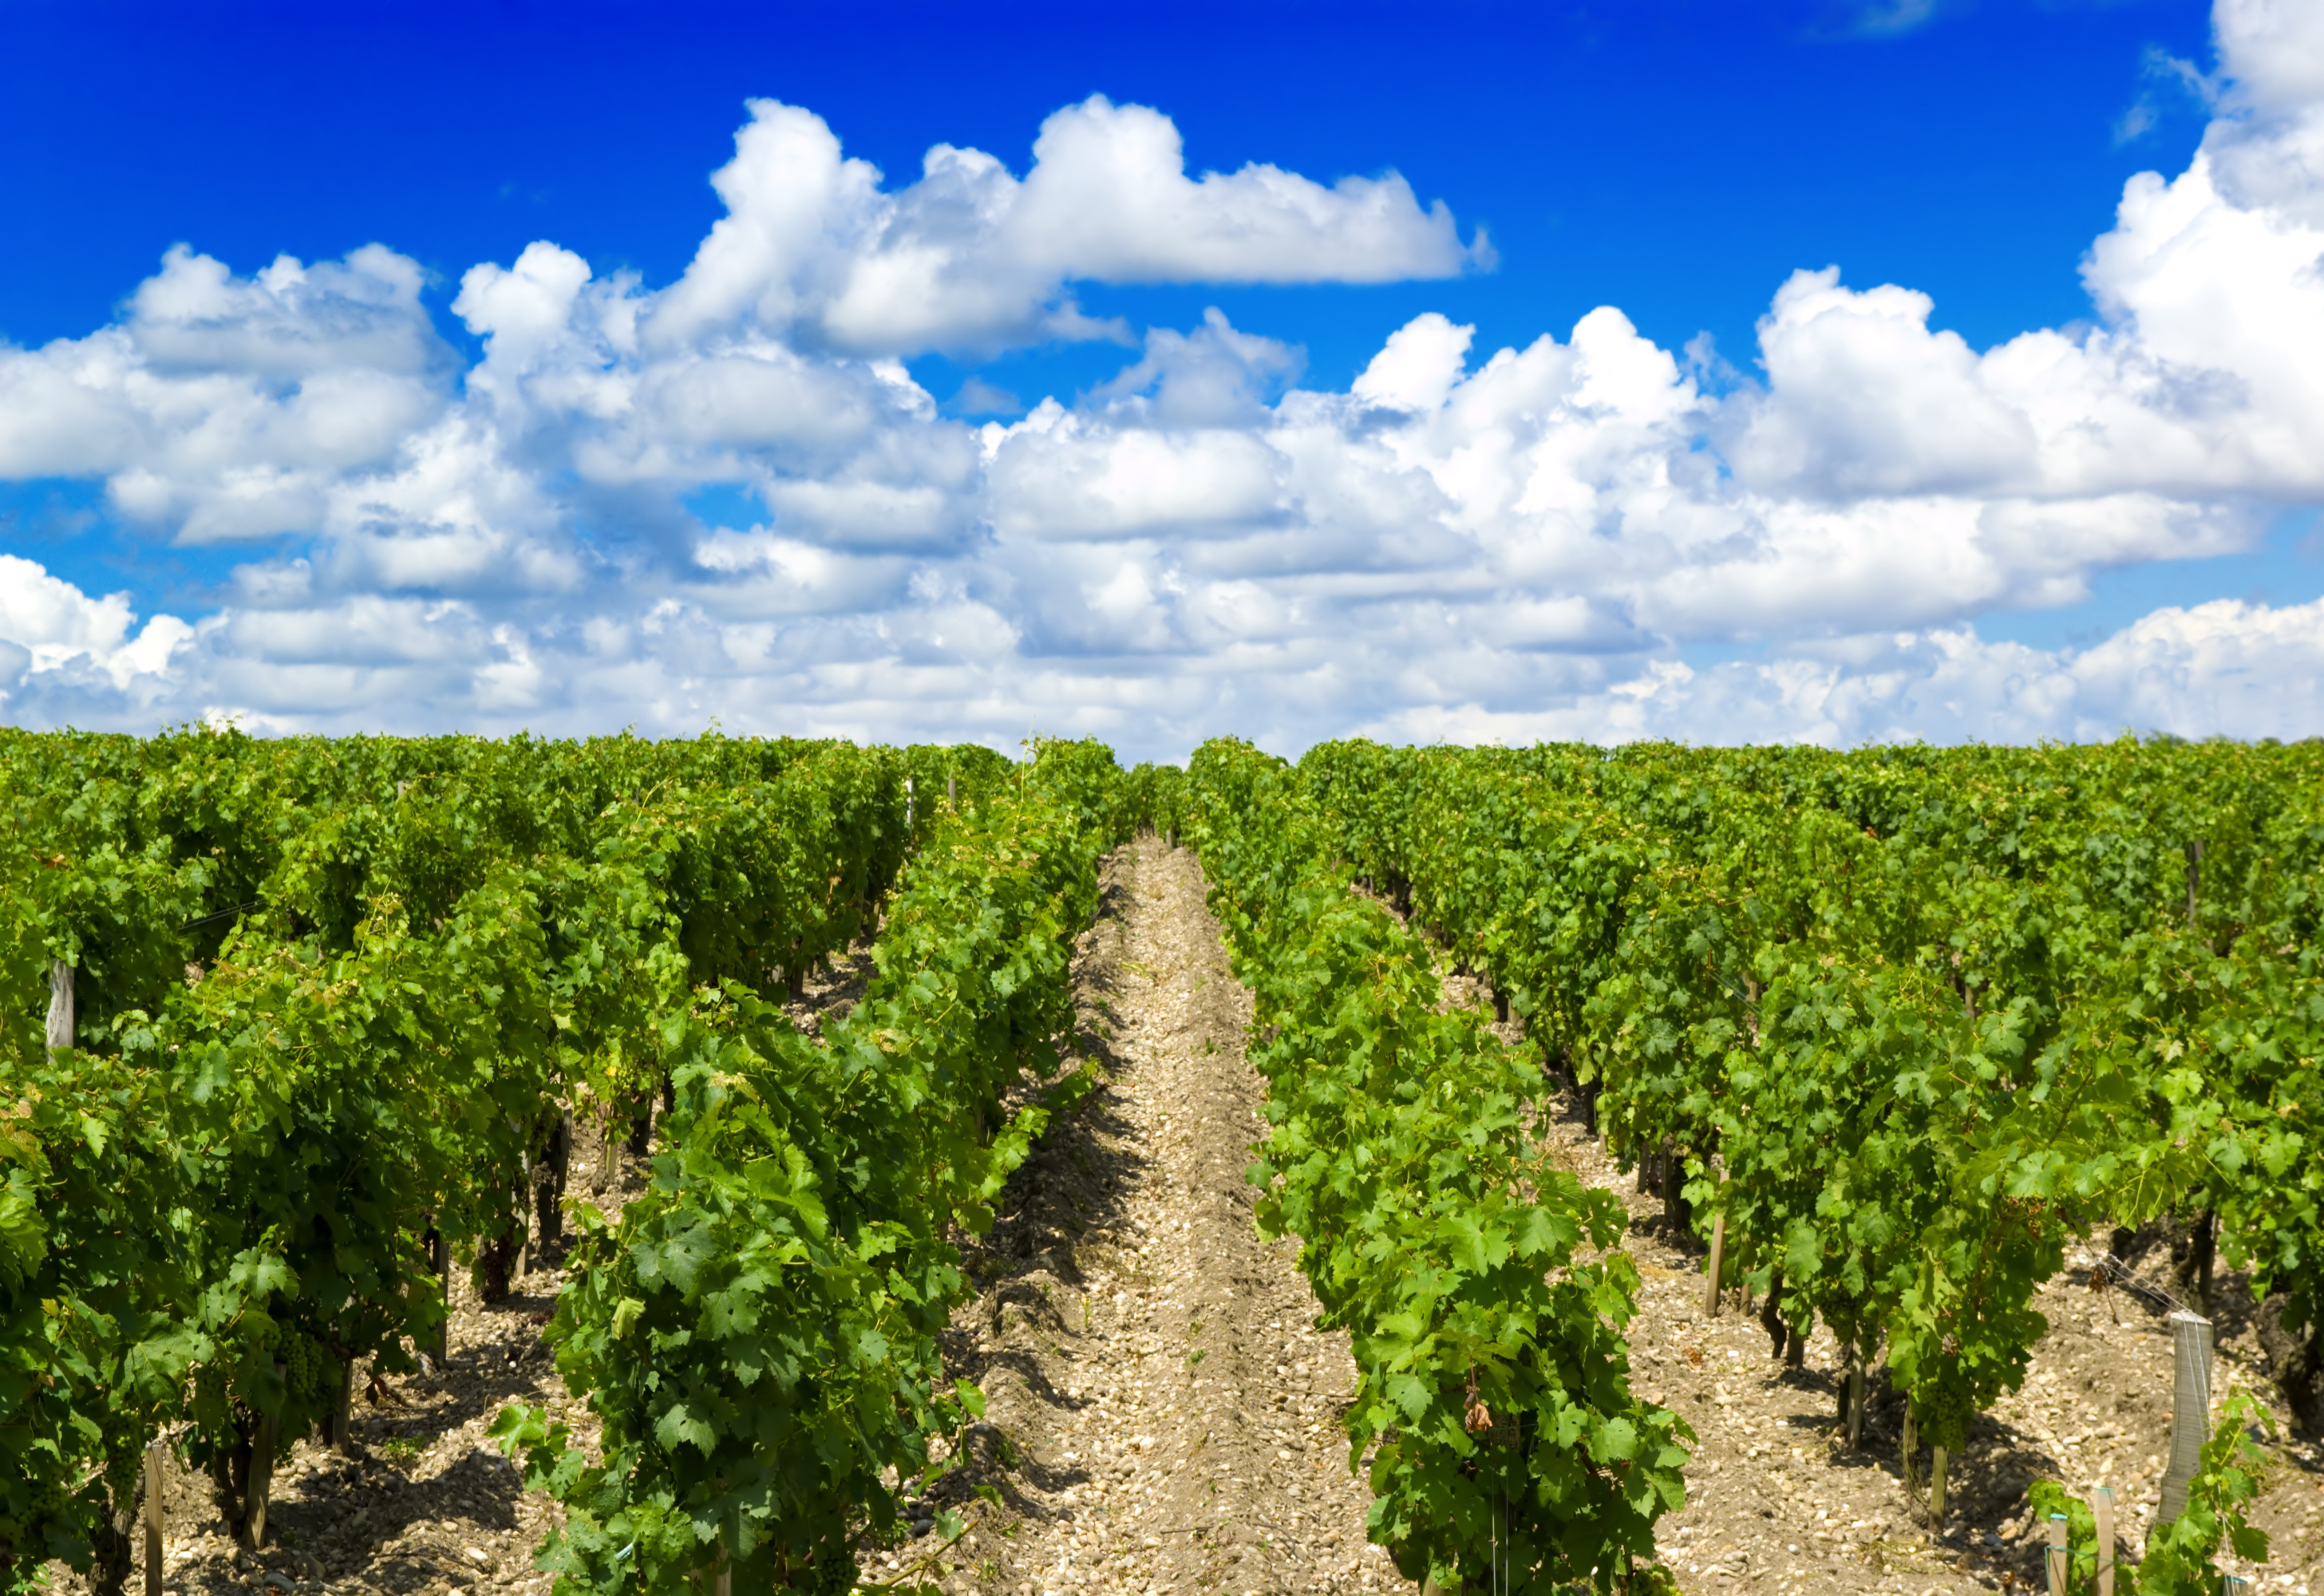 https://robert-parker-content-prod.s3.amazonaws.com/media/image/2017/02/28/f1bc79bc3d454562821e59b48f554abd_Bordeaux+Vines.jpeg